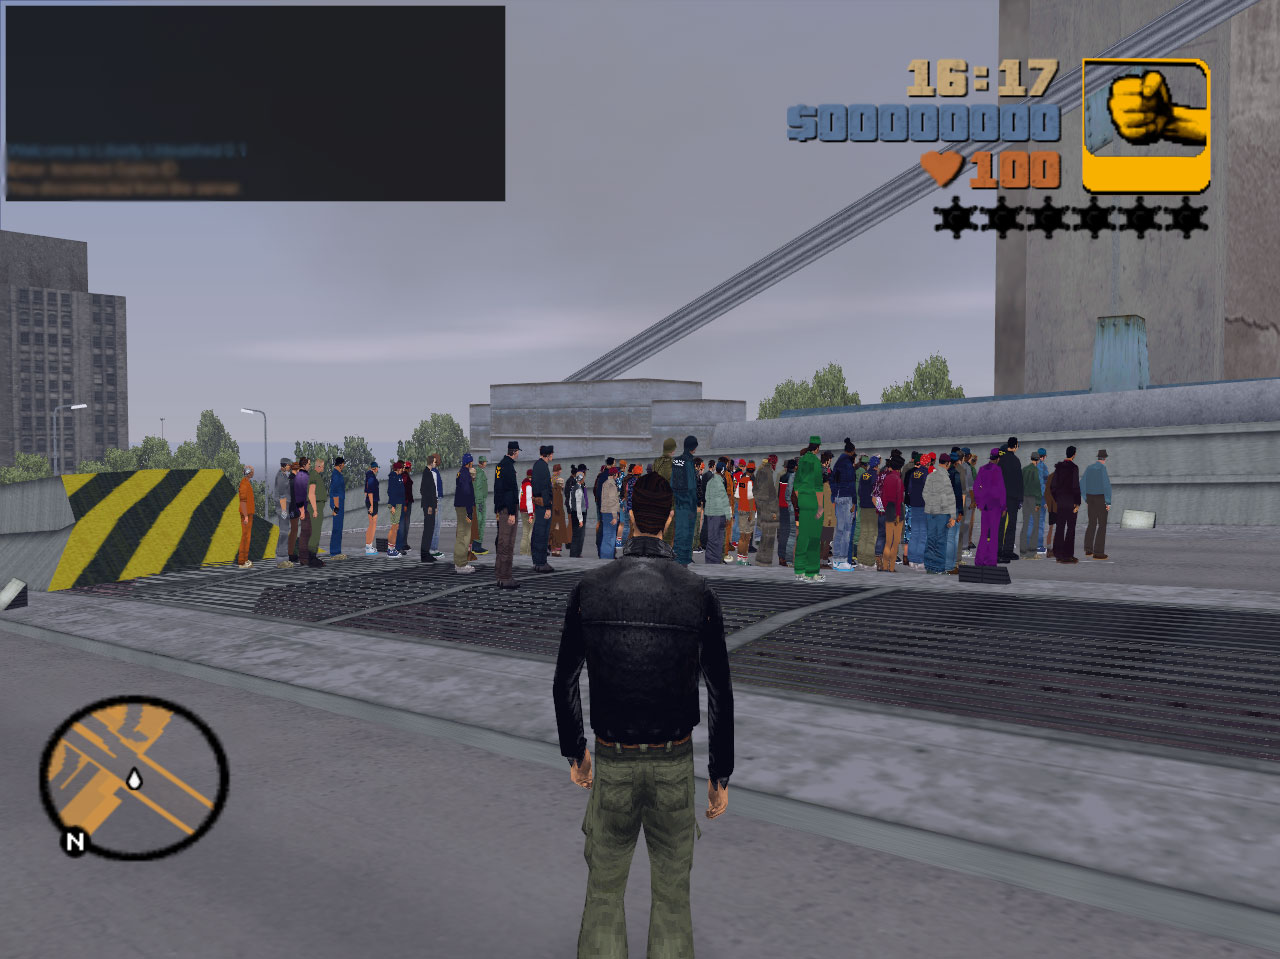 Gta 3 Online